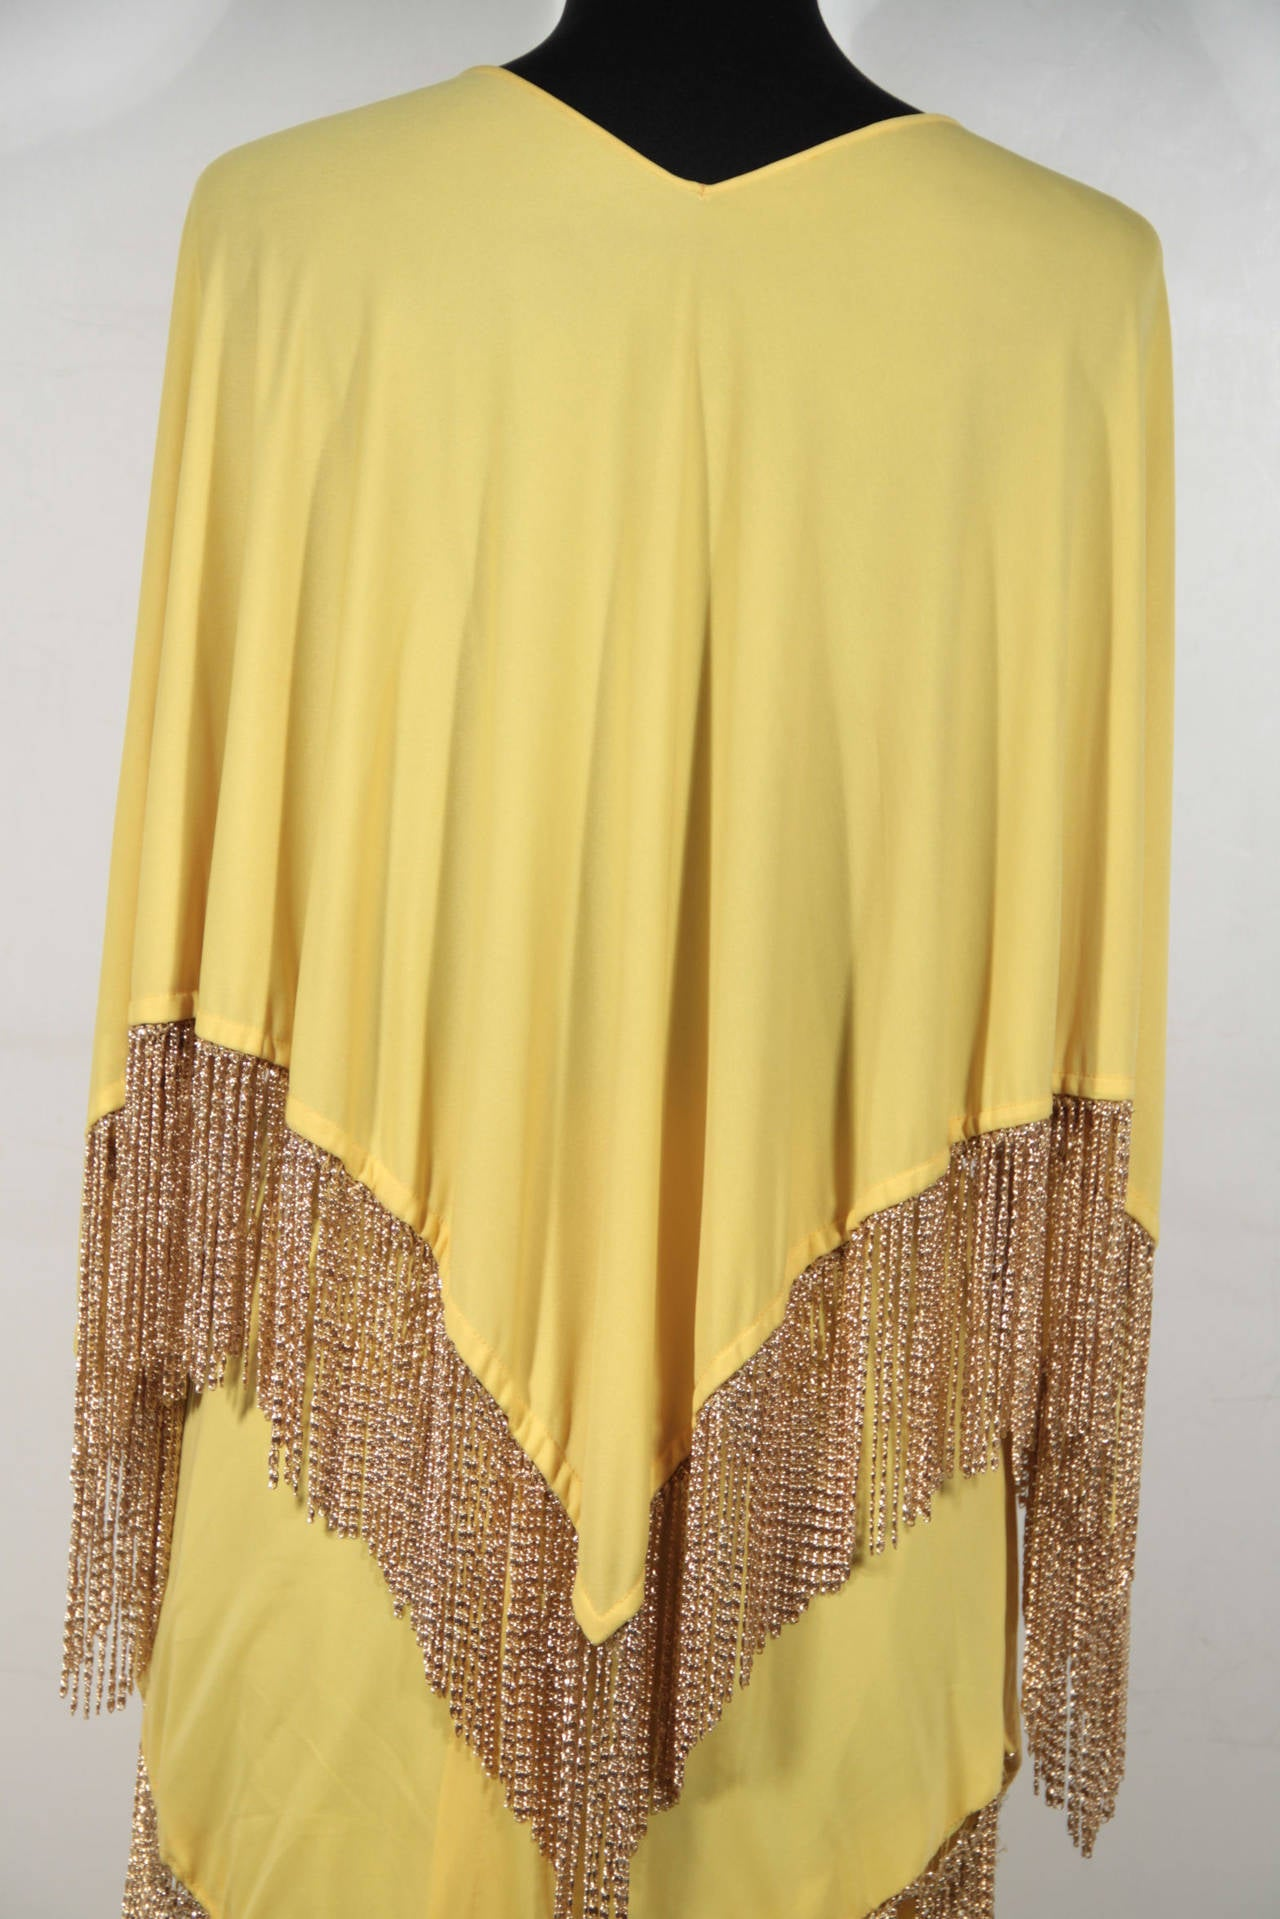 LORIS AZZARO Vintage 70s Yellow CAPE TOP & SKIRT SET Dress Long CHAIN FRINGES 5